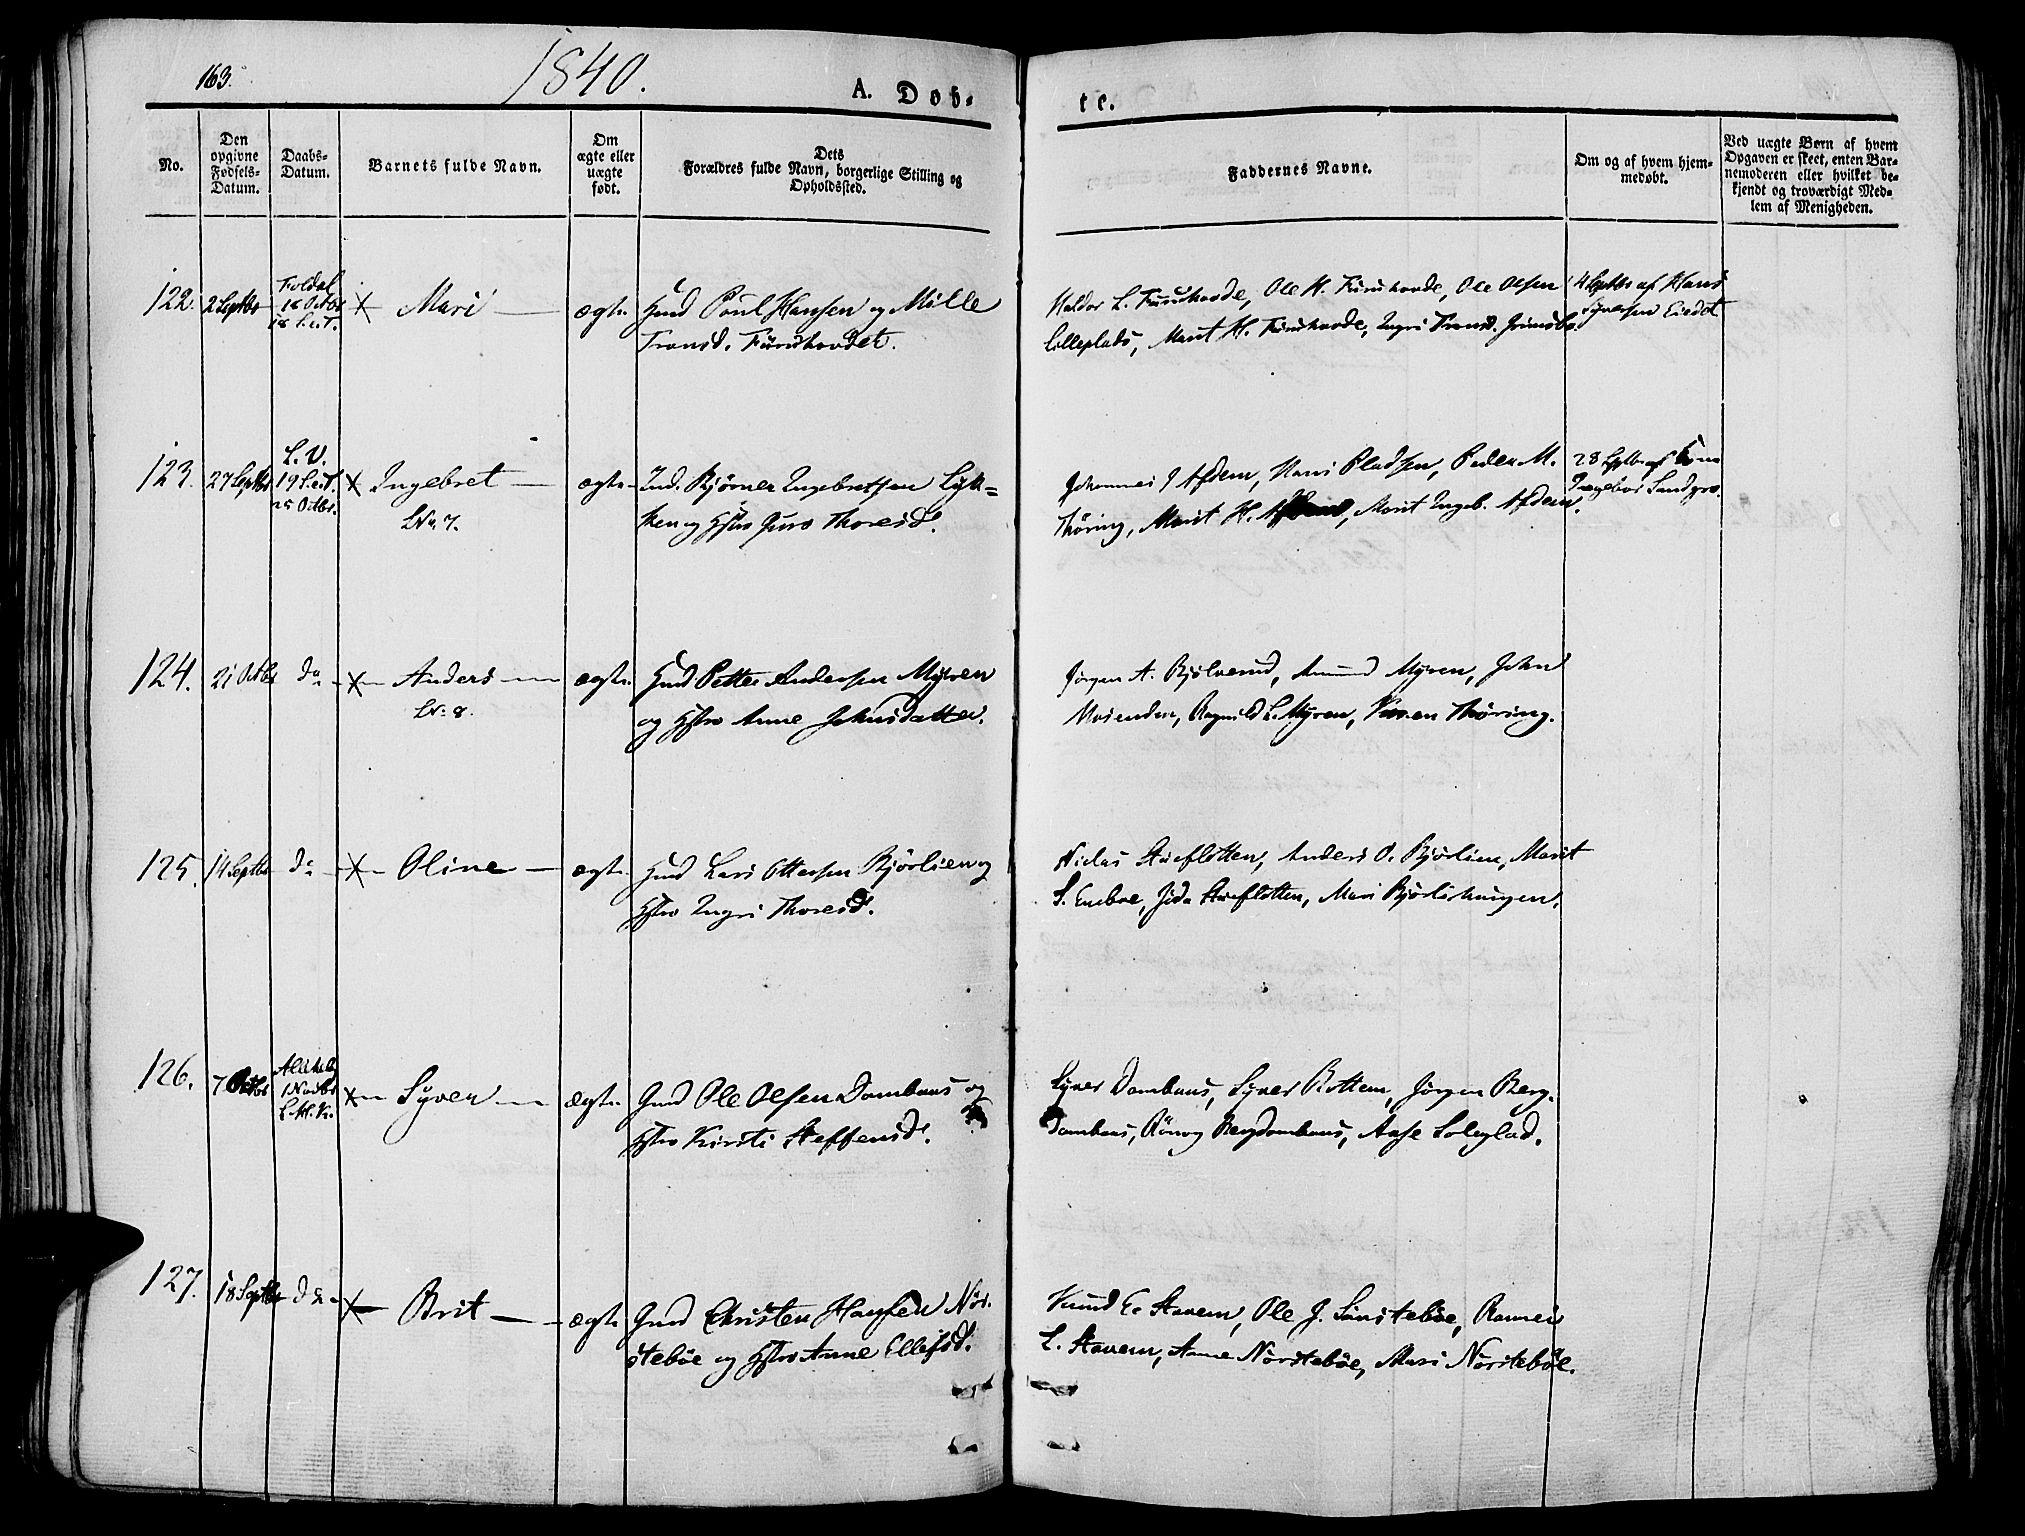 SAH, Lesja prestekontor, Ministerialbok nr. 5, 1830-1842, s. 163